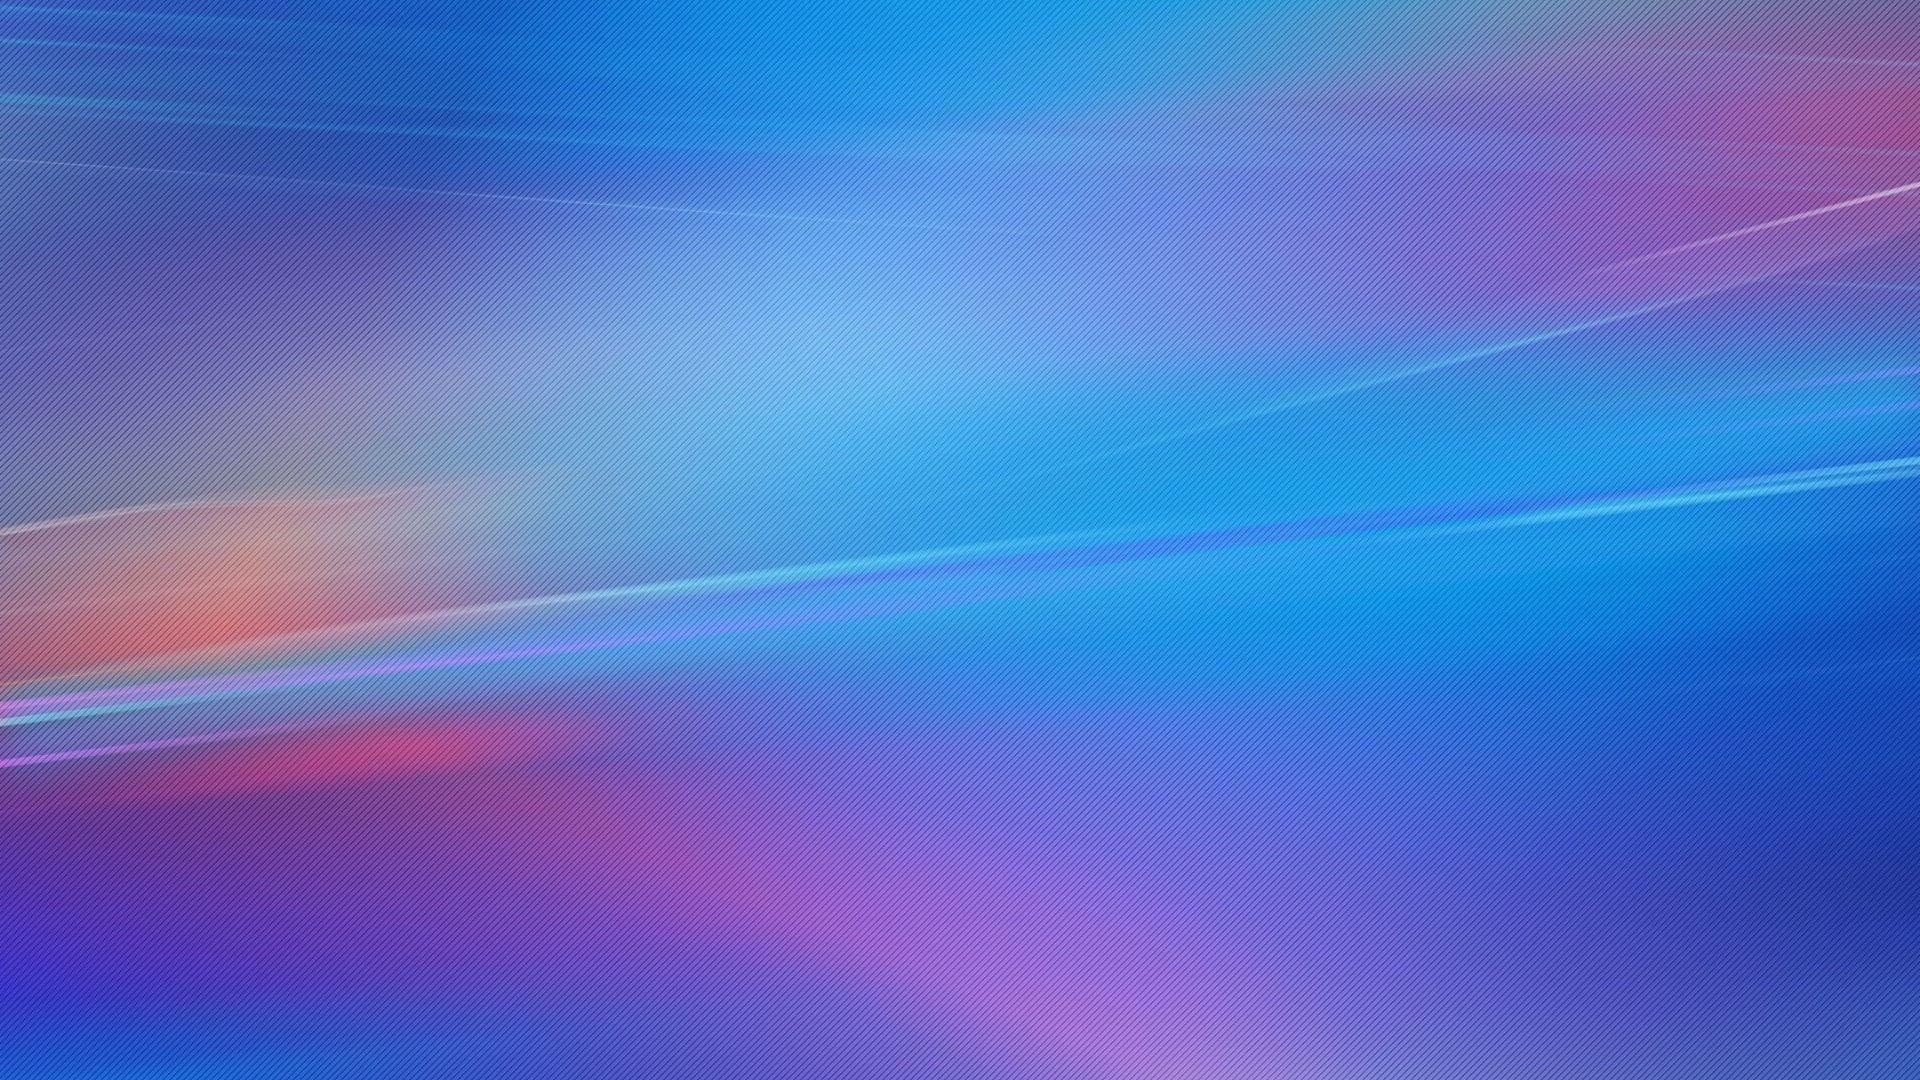 Bright download wallpaper image